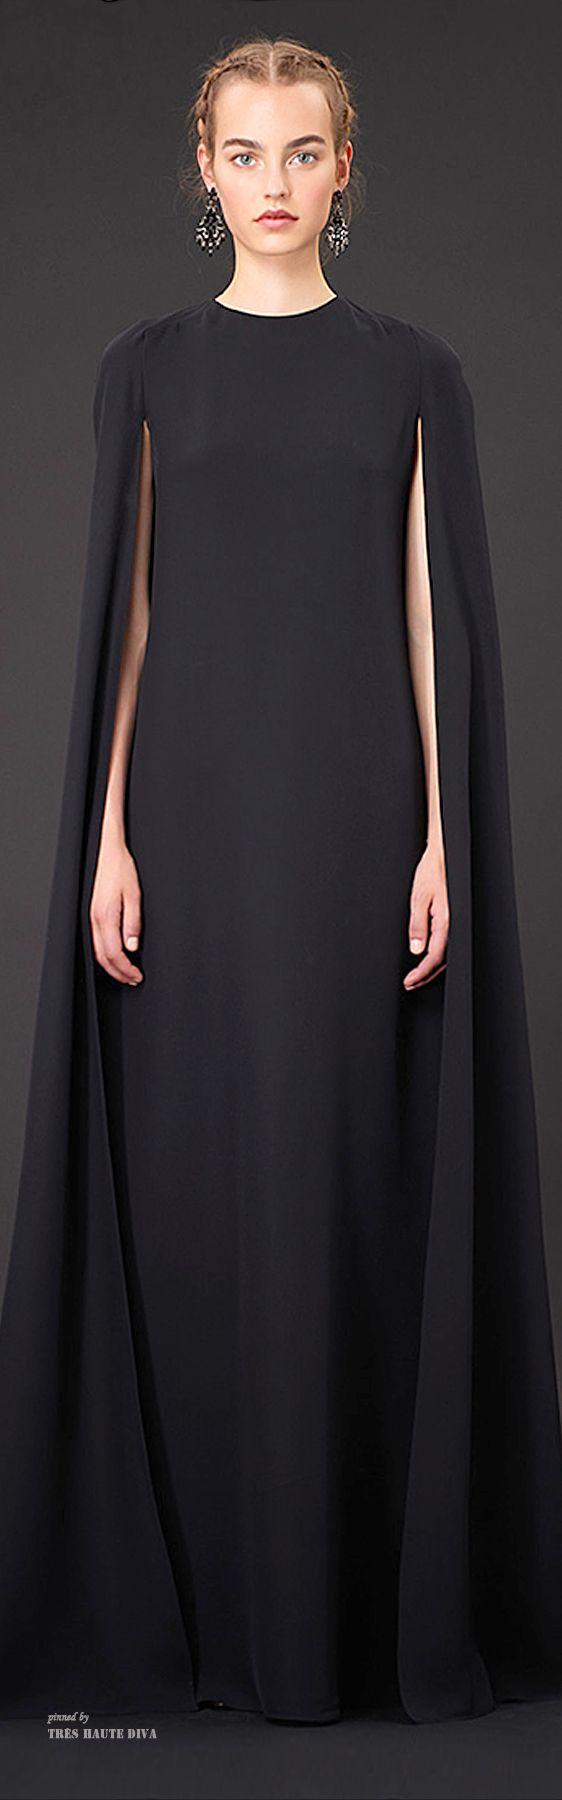 Valentino Resort 2015-- Make a great silhouette statement.  SilhouettesbyCindi.com Valentino silhouette!  Chic fashion silhouettes!